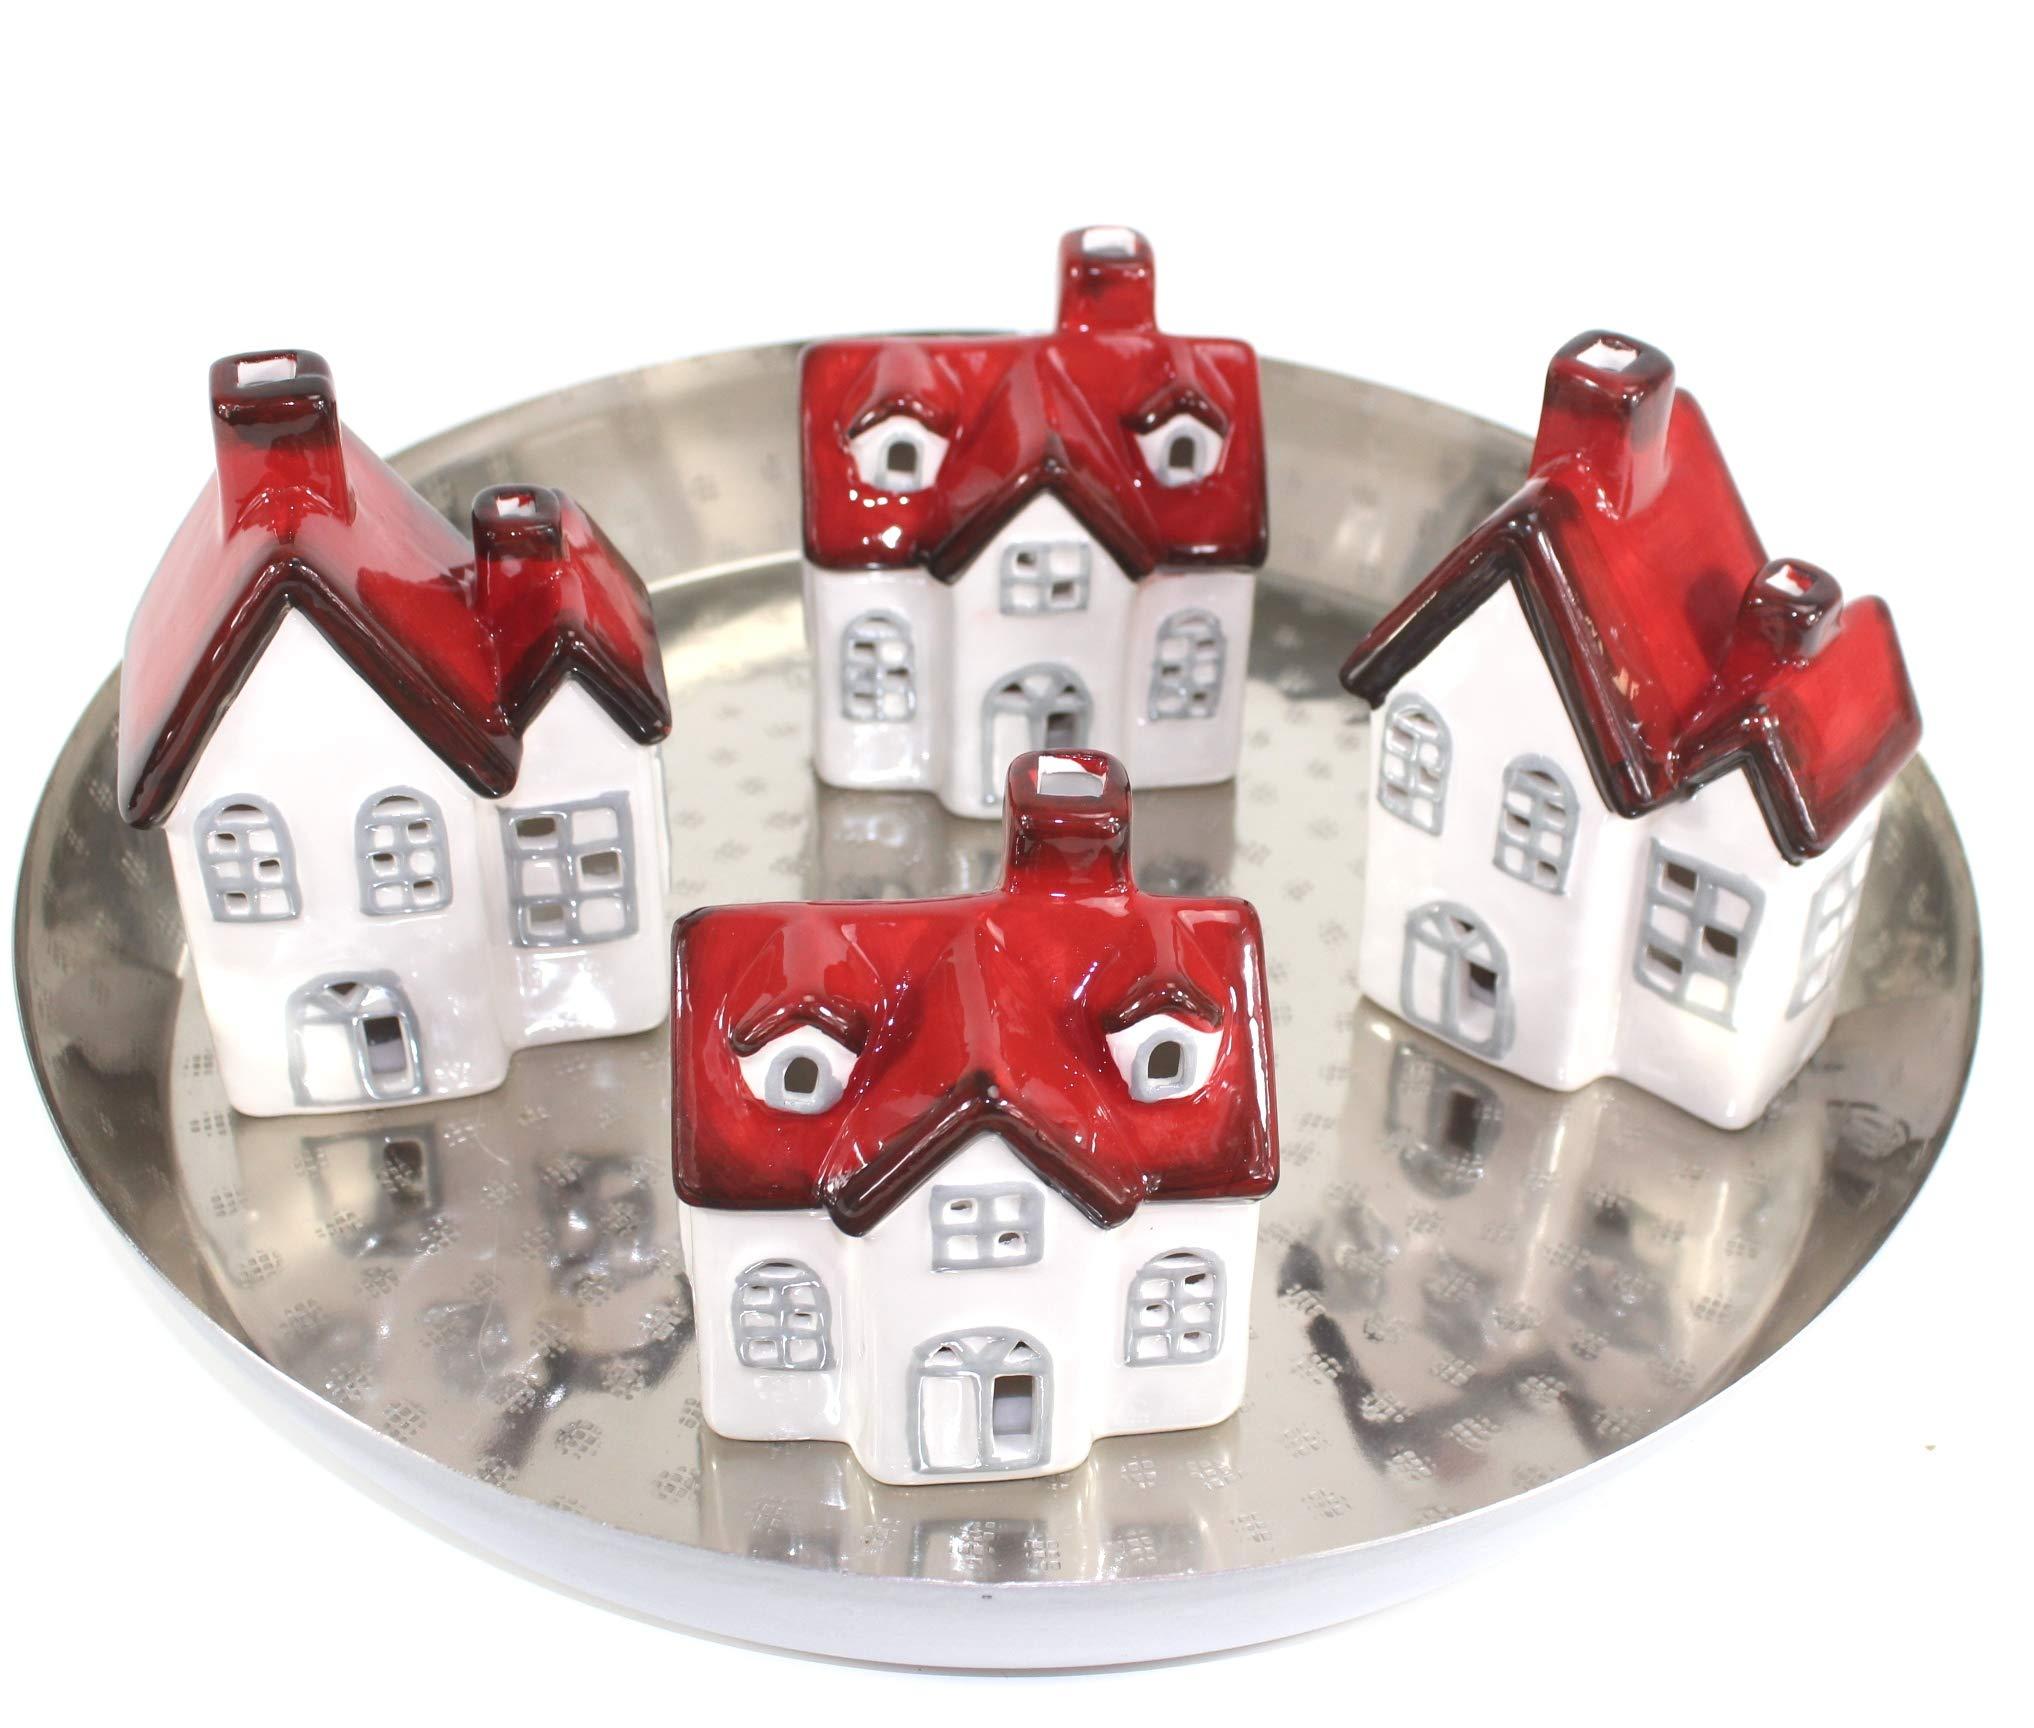 qm-Adventsgesteck-Adventskranz-Tischdeko-Tablett-Silber-Metall-LED-Huser-vds890